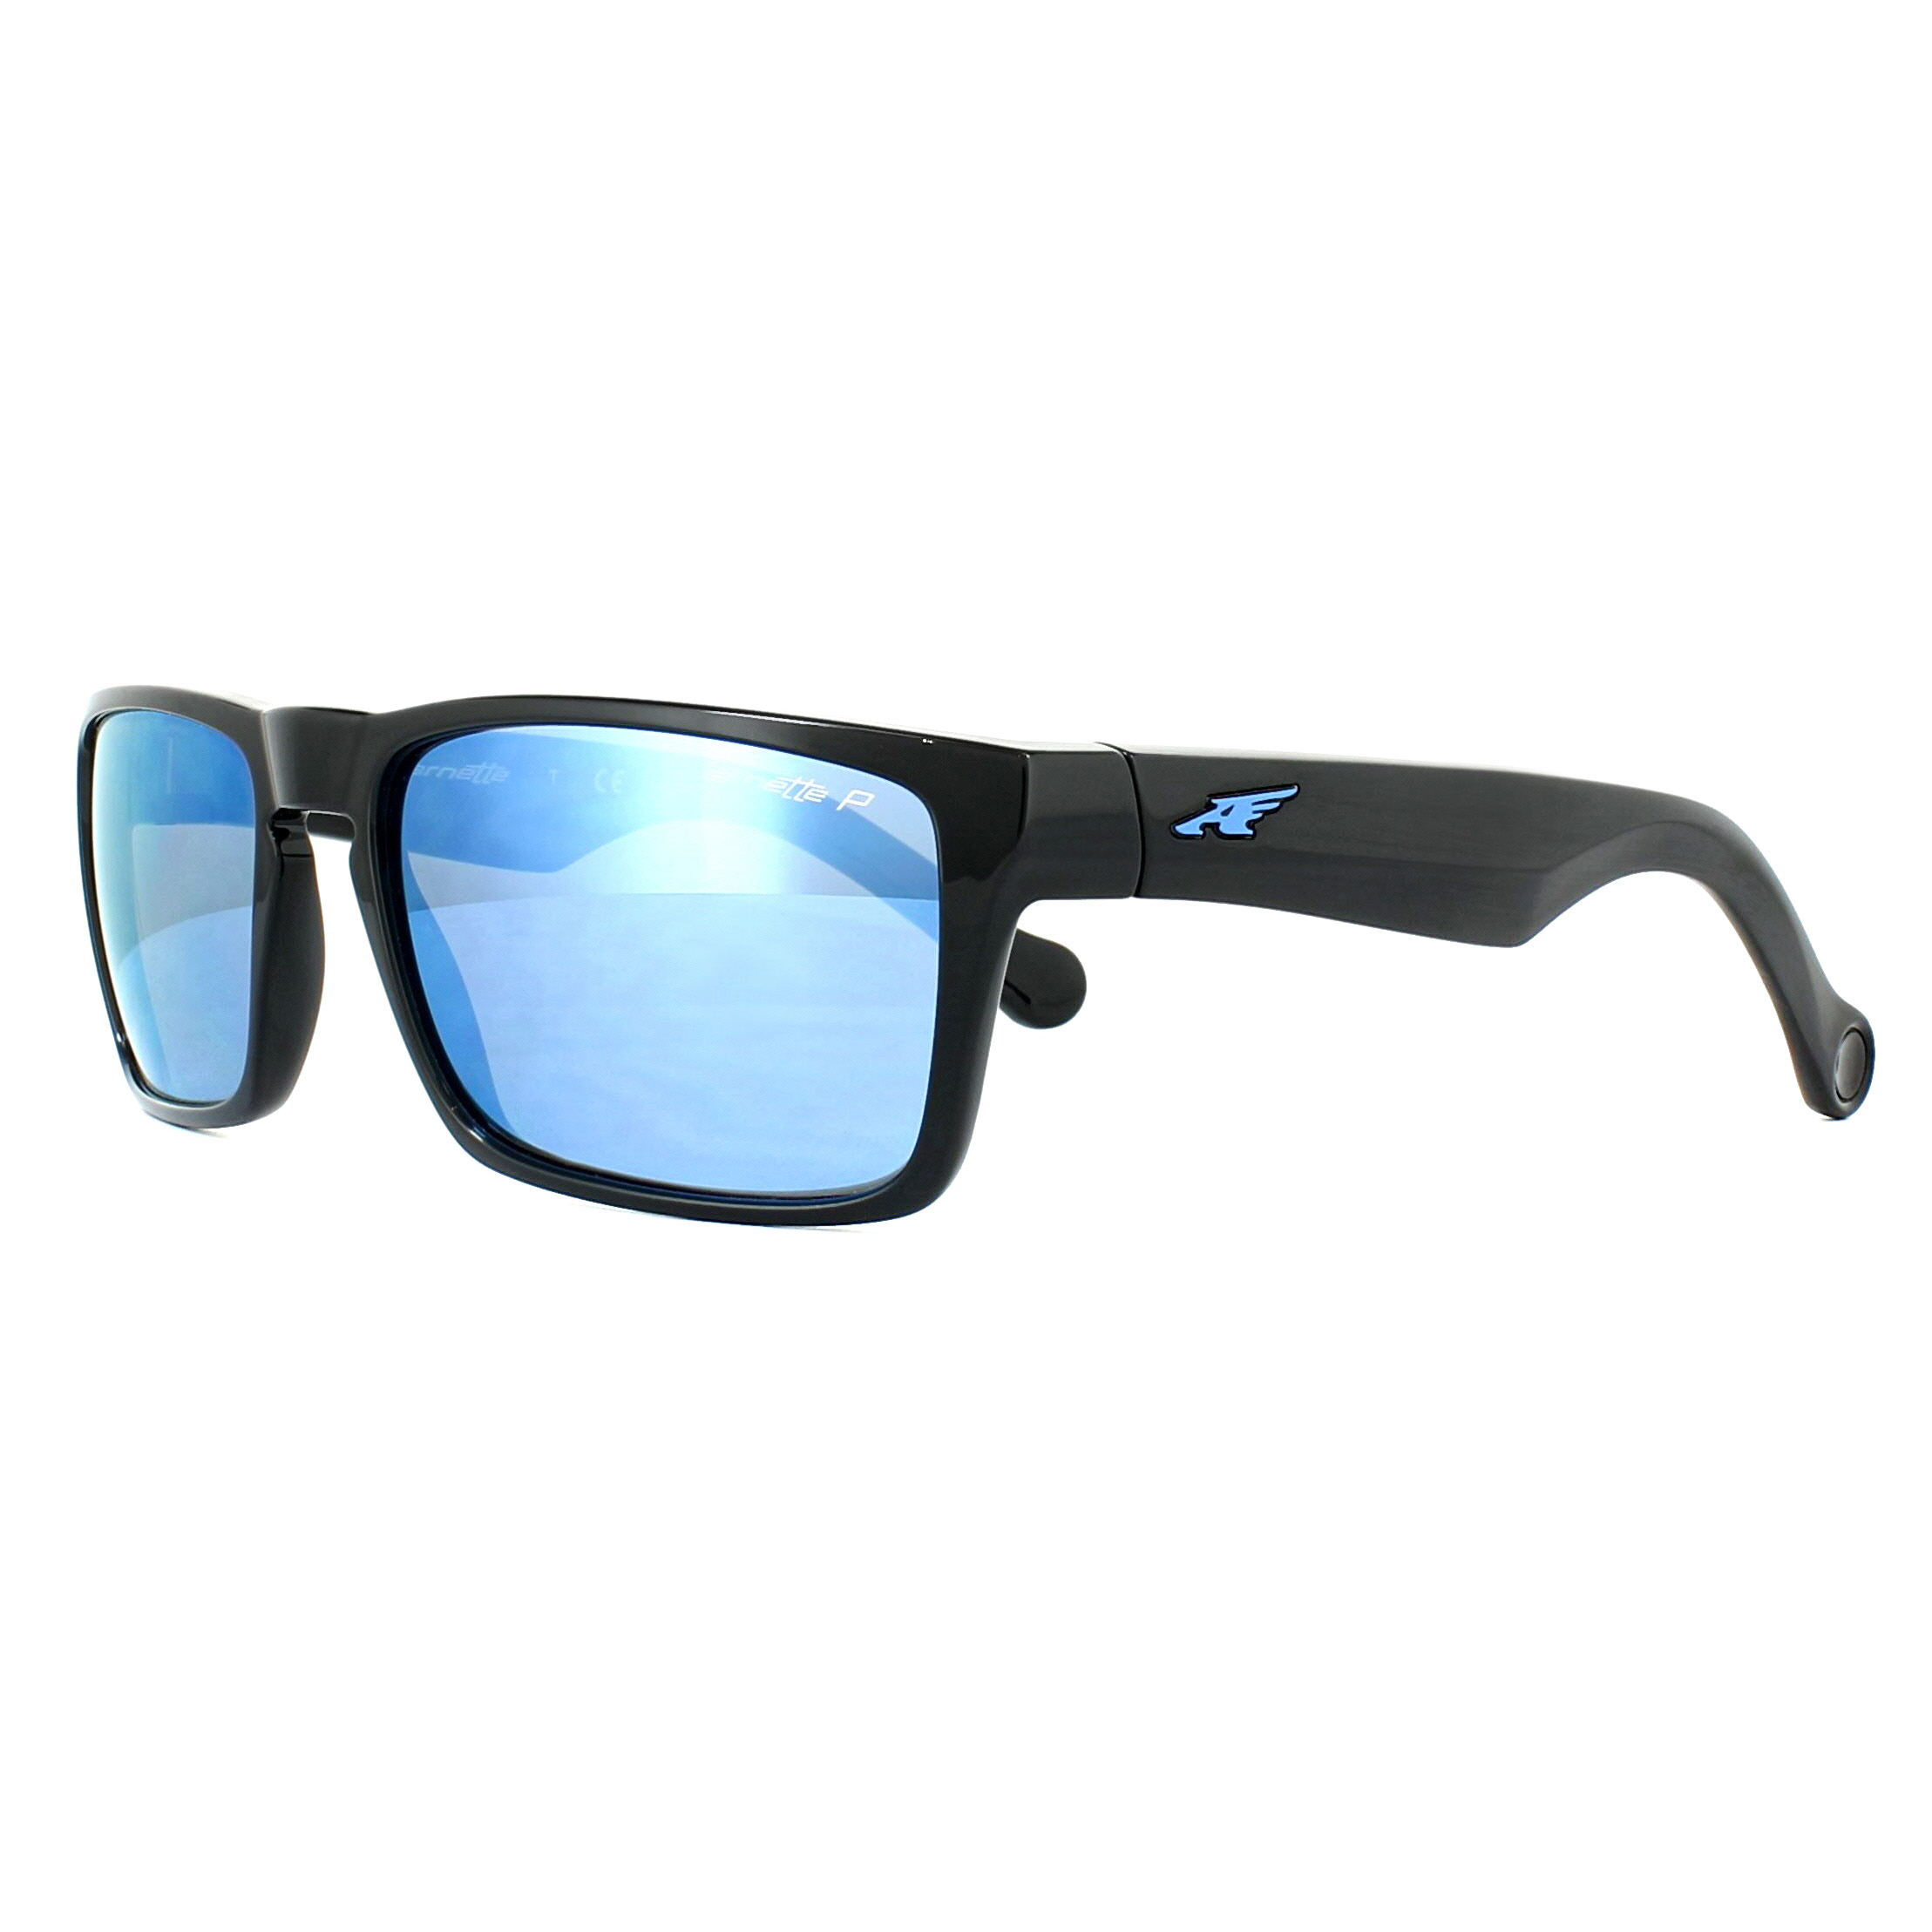 e81479af1 Sentinel Arnette Sunglasses Specialist 4204 41/22 Black Grey Mirror Water  Polarized